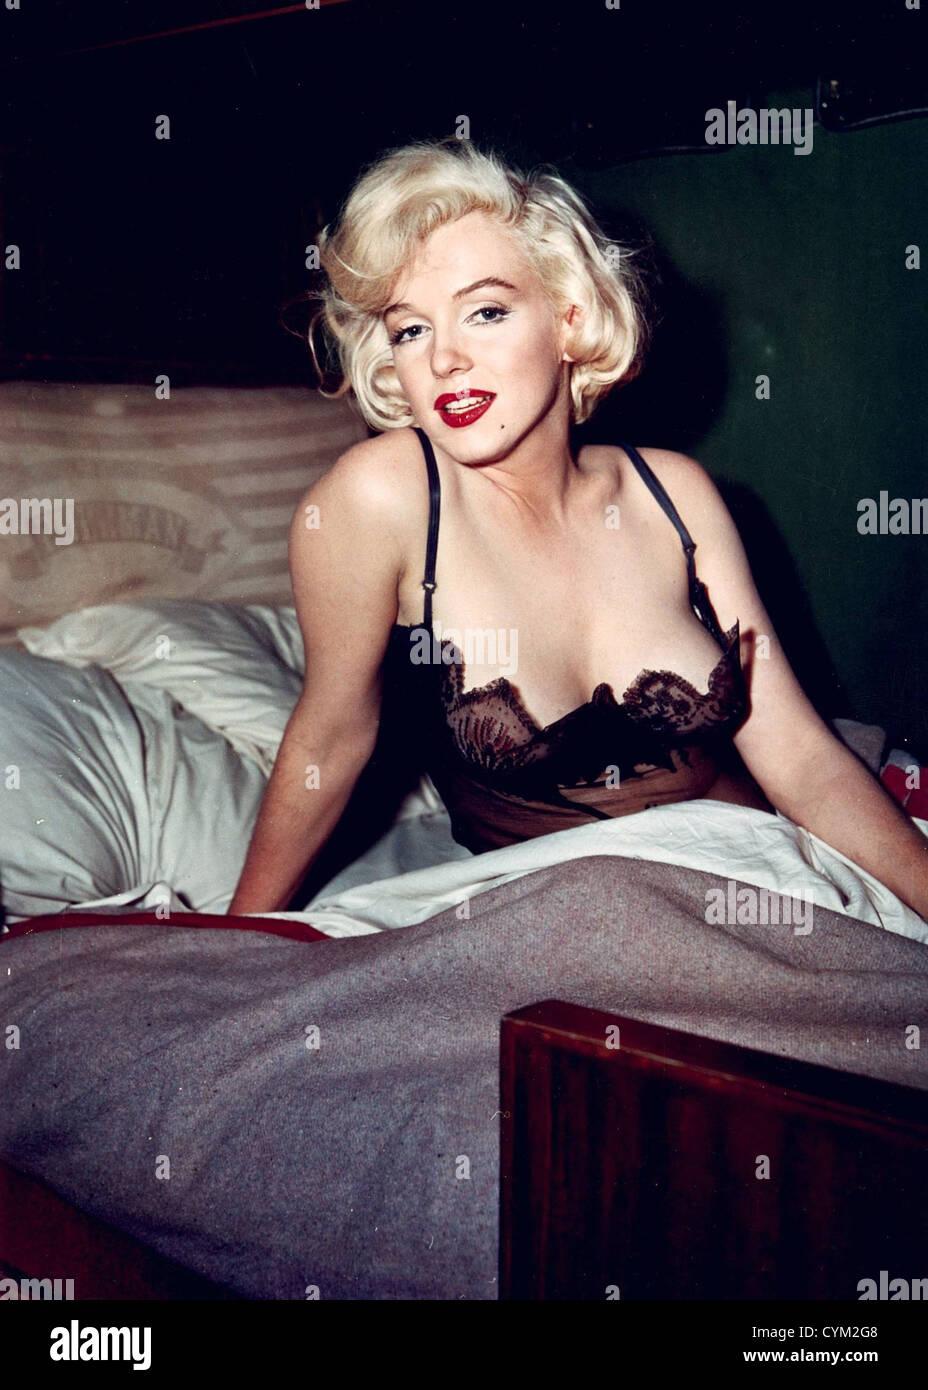 Marilyn Monroe Some Like it Hot 1959 Director: Billy Wilder - Stock Image